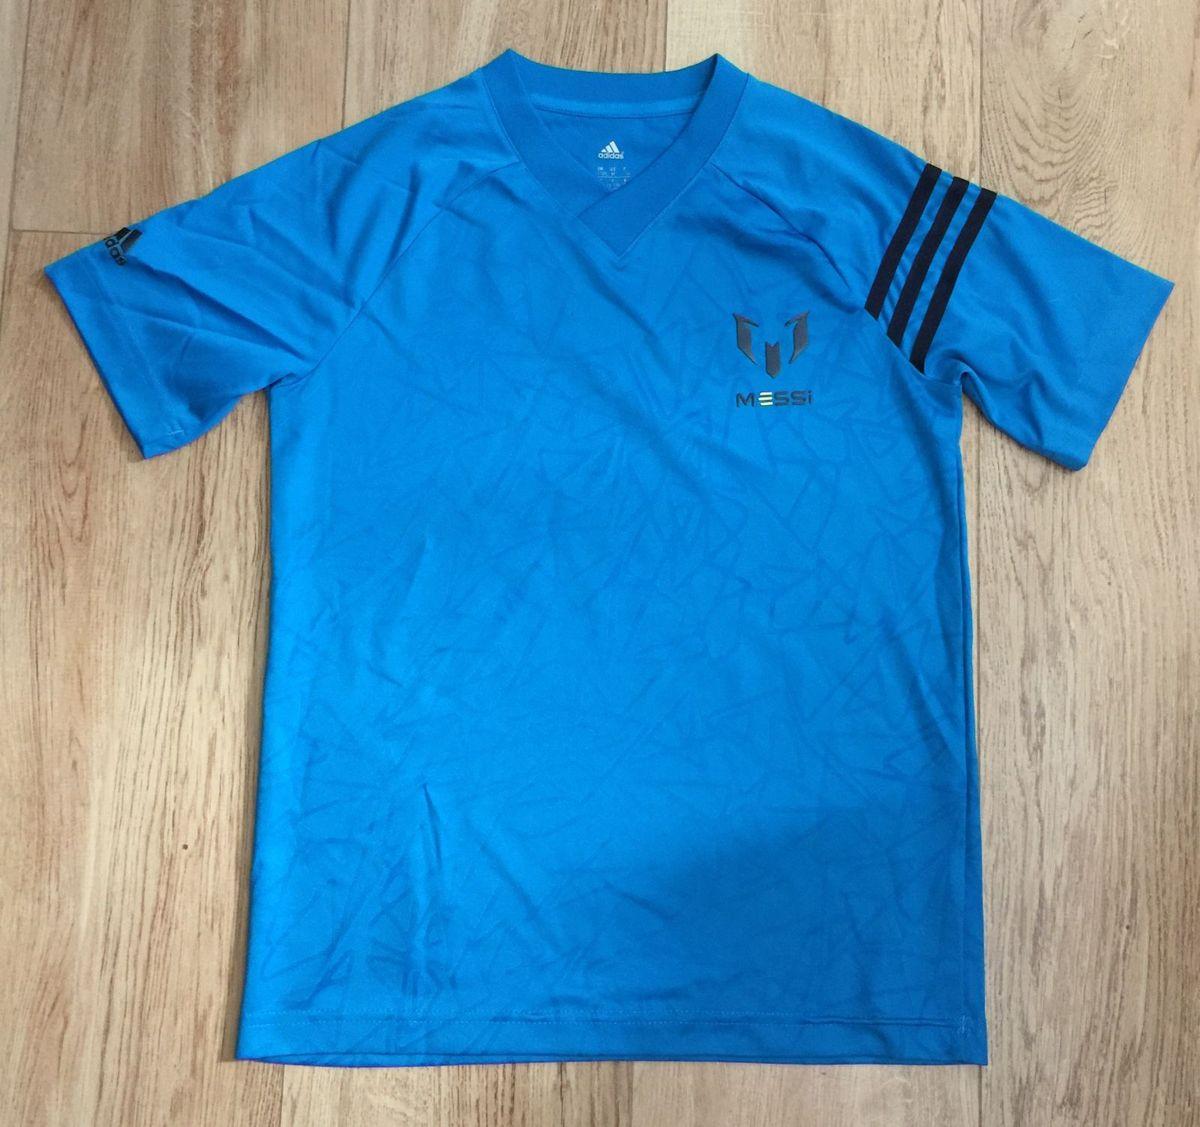 1864e2b682 camiseta infantil oficial messi - menino adidas.  Czm6ly9wag90b3muzw5qb2vplmnvbs5ici9wcm9kdwn0cy82oda2oc9lmzmxyje3m2e3ndjlywm3m2y2mgmwnzawyjzimmm5nc5qcgc  ...